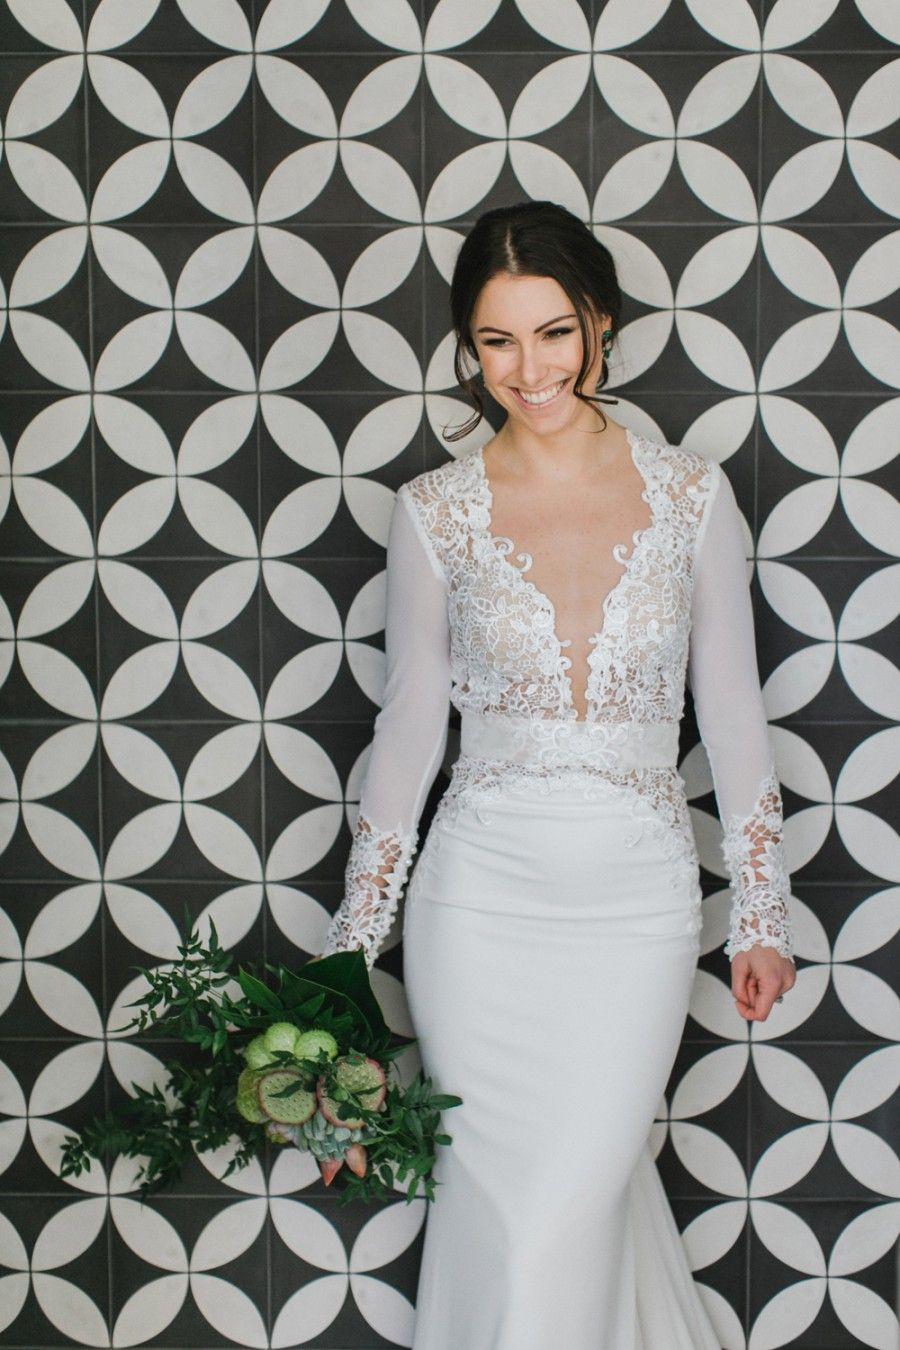 Amy's wedding dress  Berta Bridal wedding gown  Photography by John Benavente  wedding